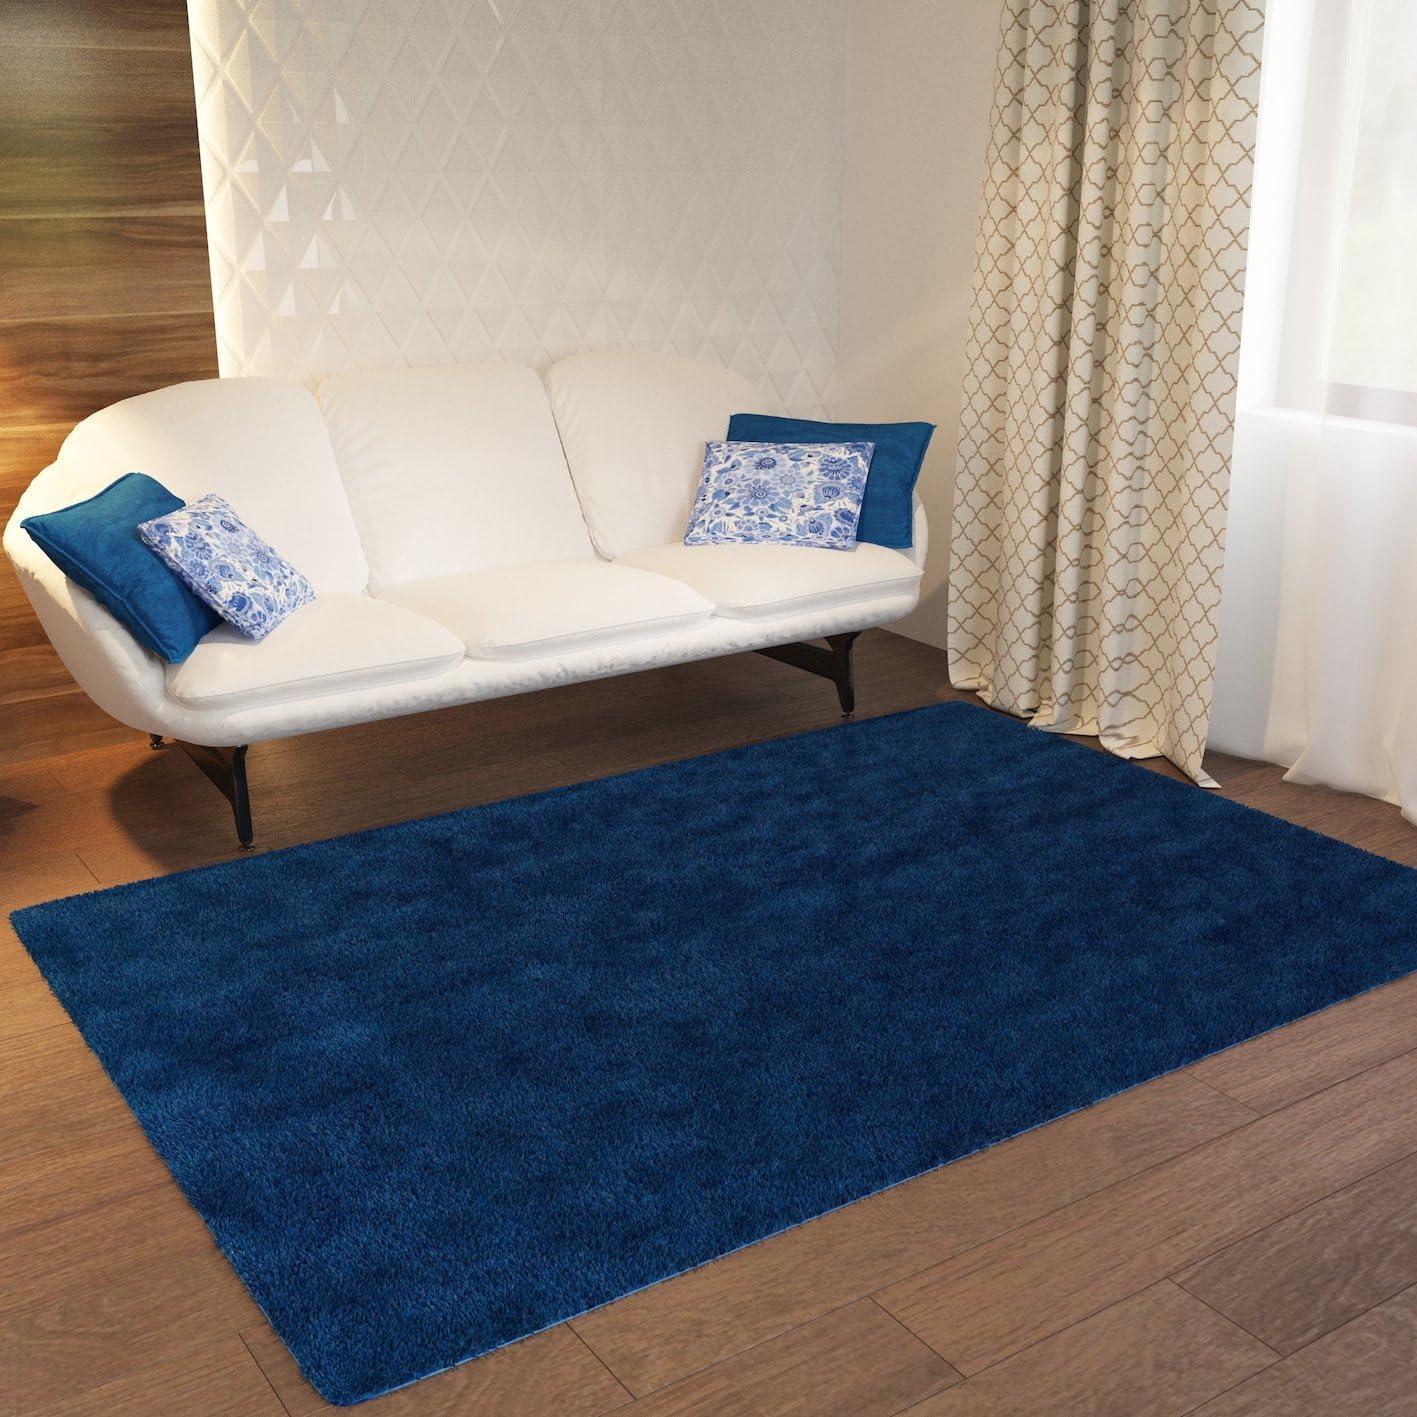 Home Way Dark Blue Plain Solid Shag Area Rug Solid Color 3'3'' x 5'3'' Plain Modern Area Rug Living Kids Room Bedroom Playroom Baby Room Bathroom Rug Easy Clean Soft Plush Quality Carpet